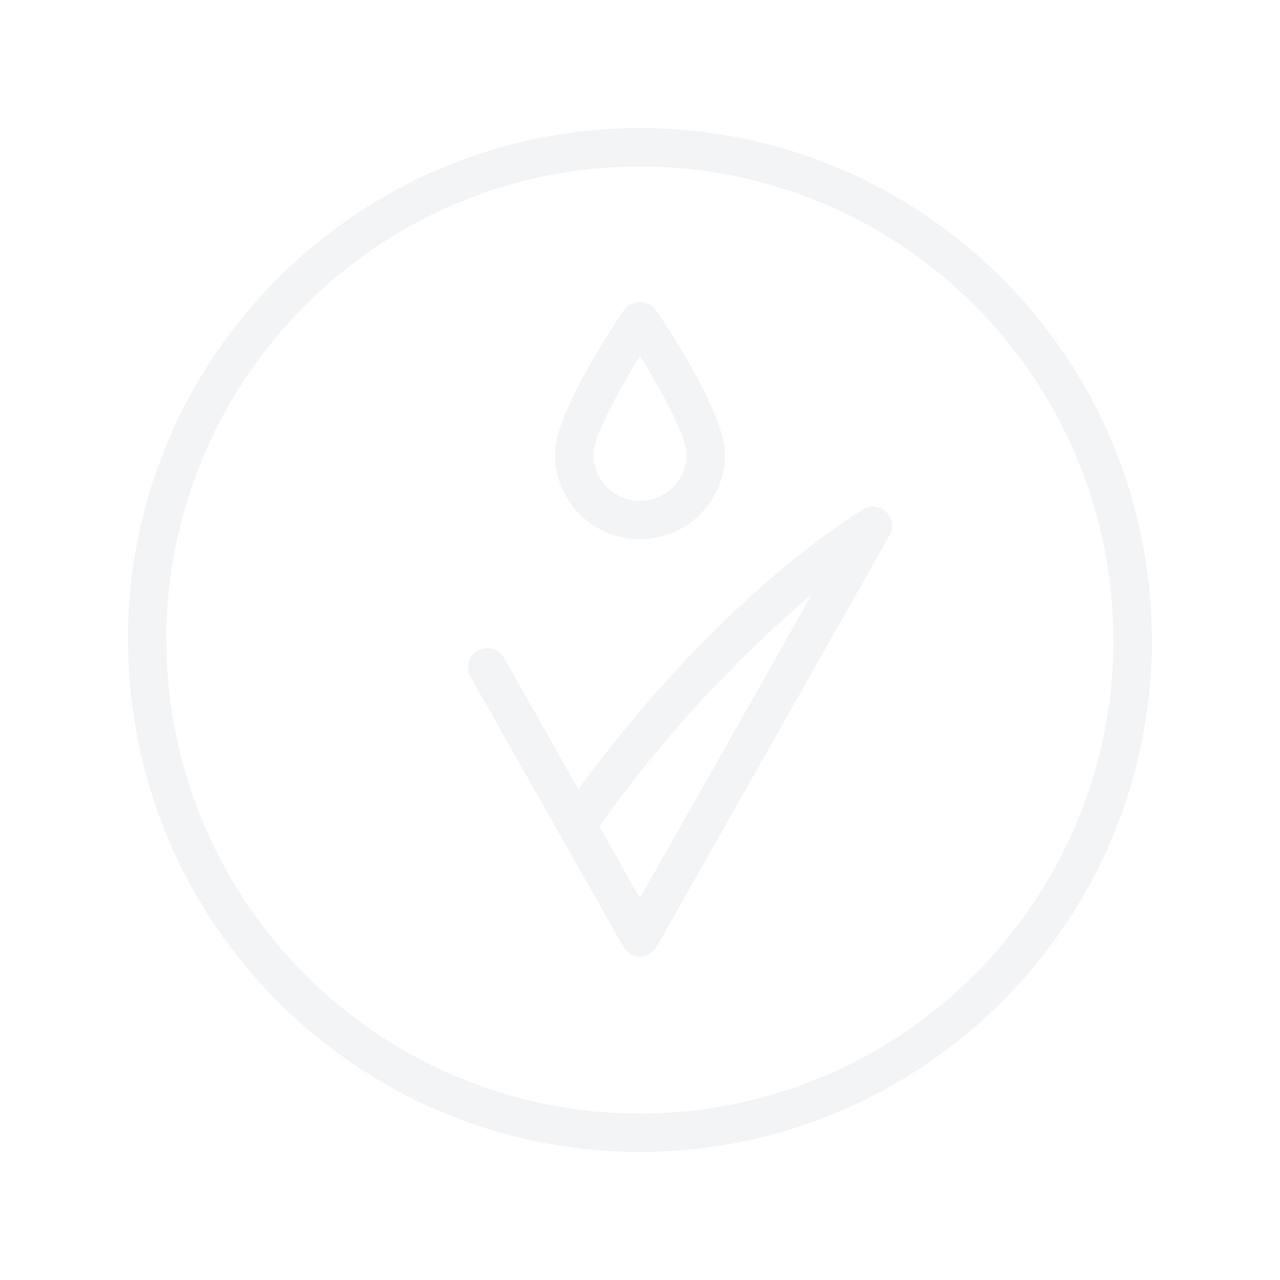 Vichy Liftactiv Flexiteint Anti-Wrinkle Foundation SPF20 30ml